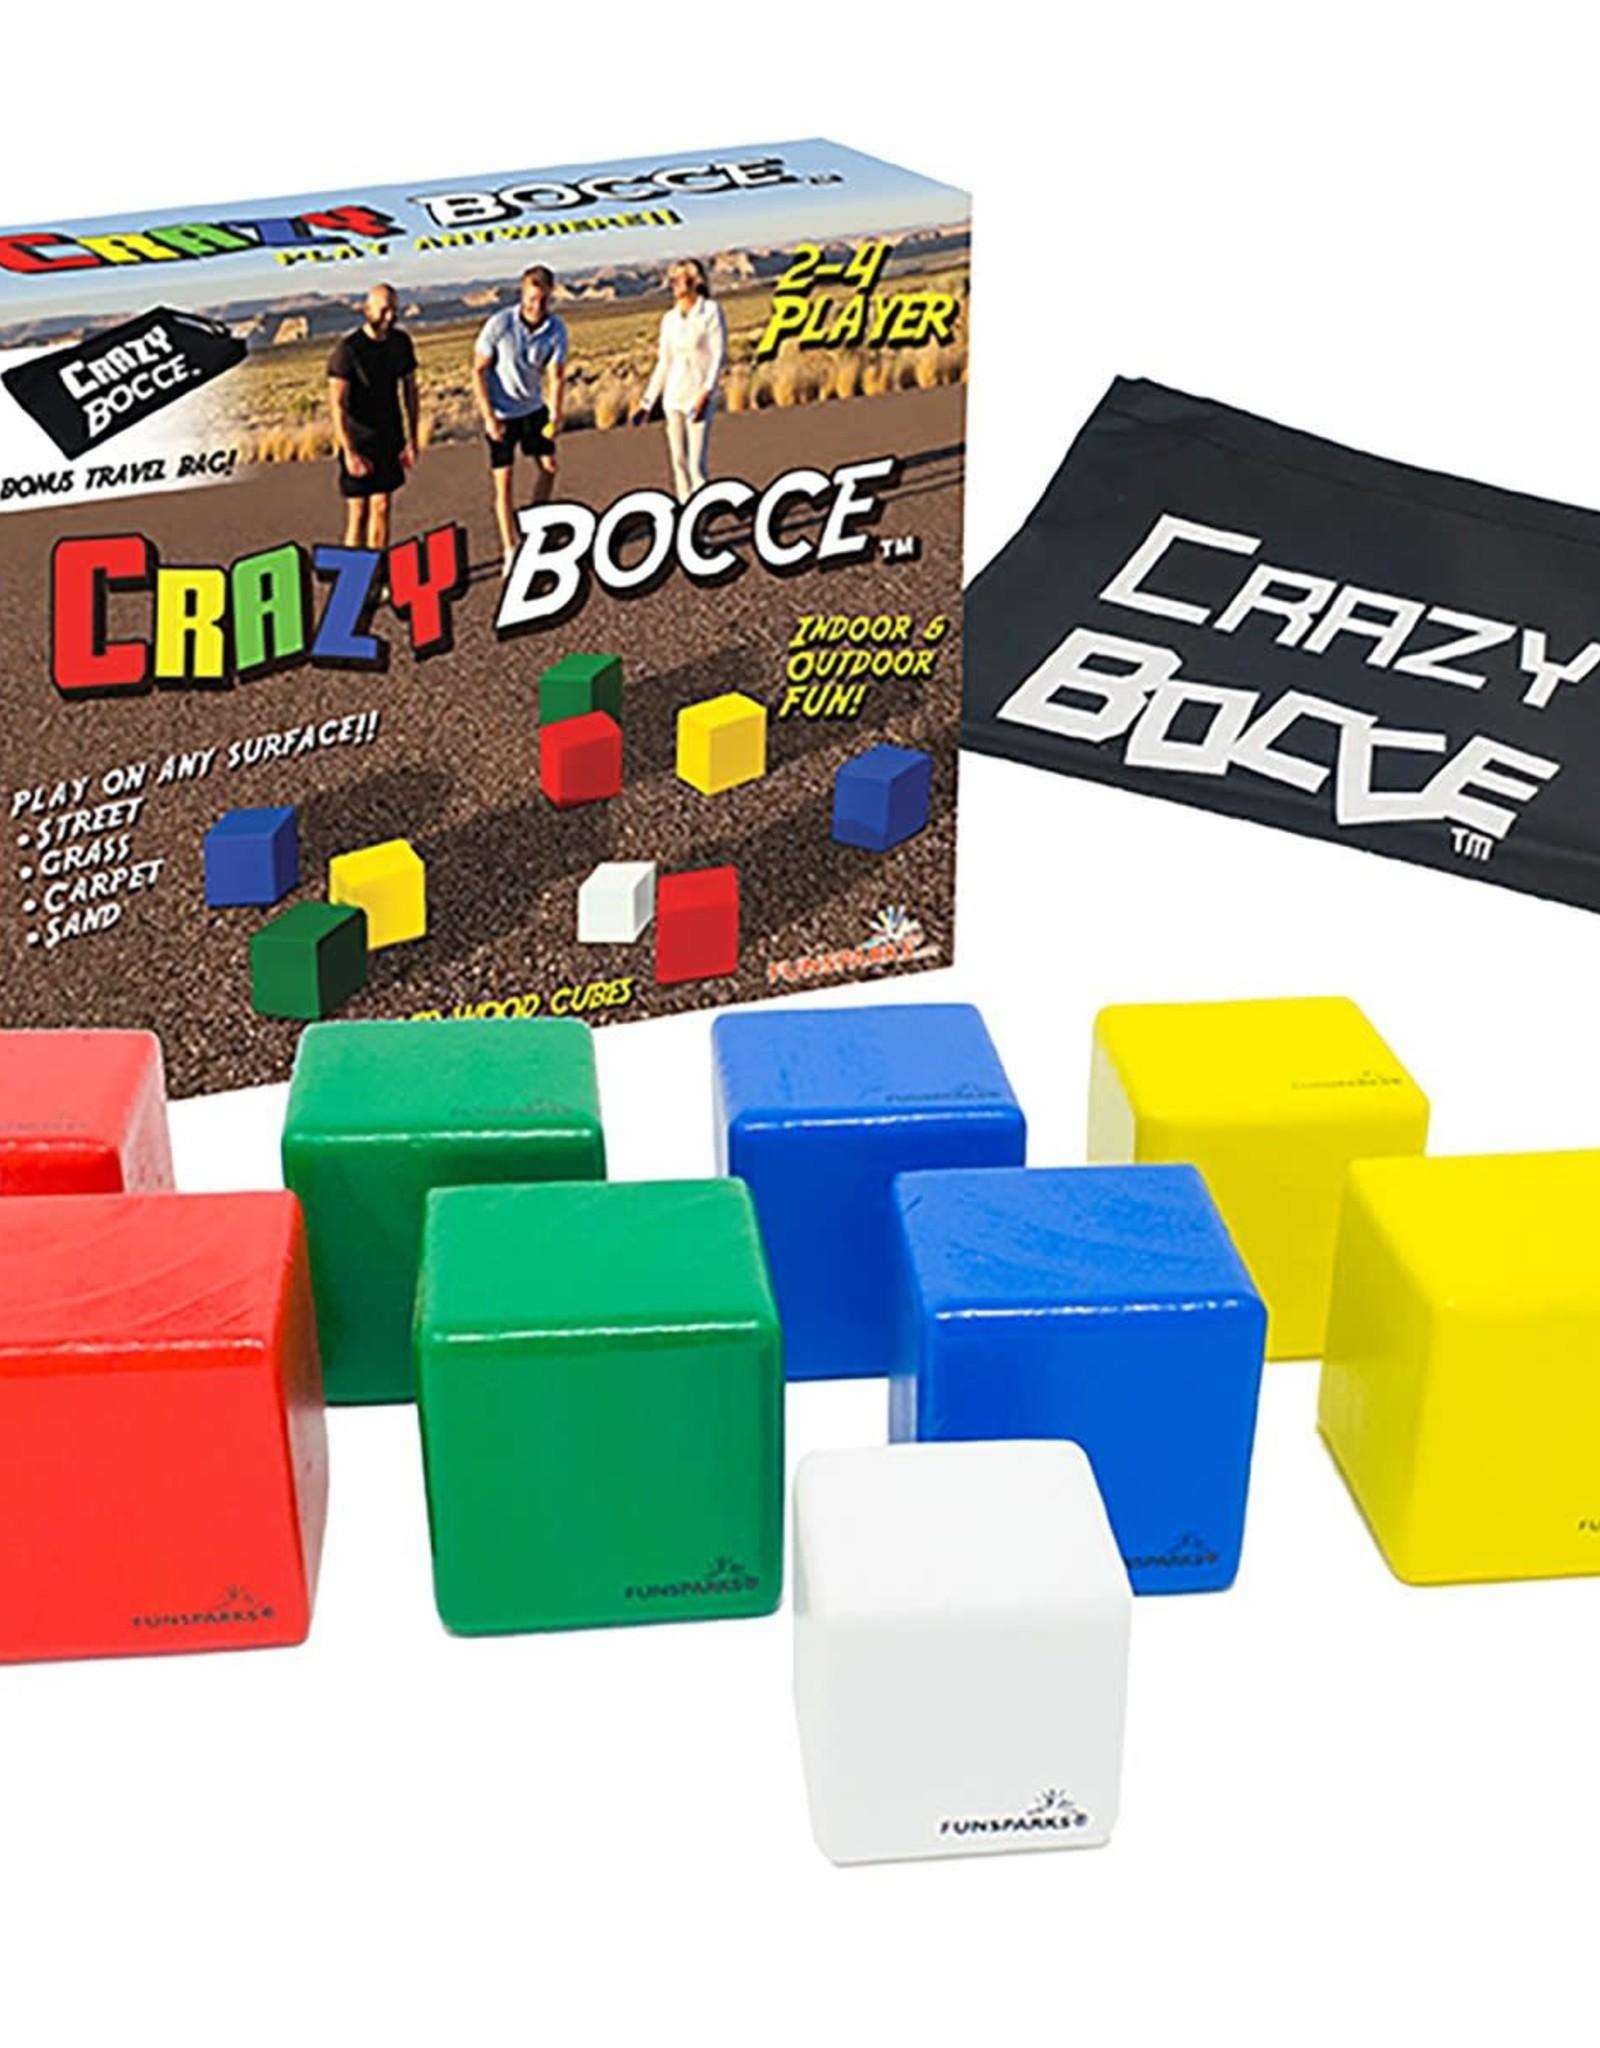 Crazy Bocce